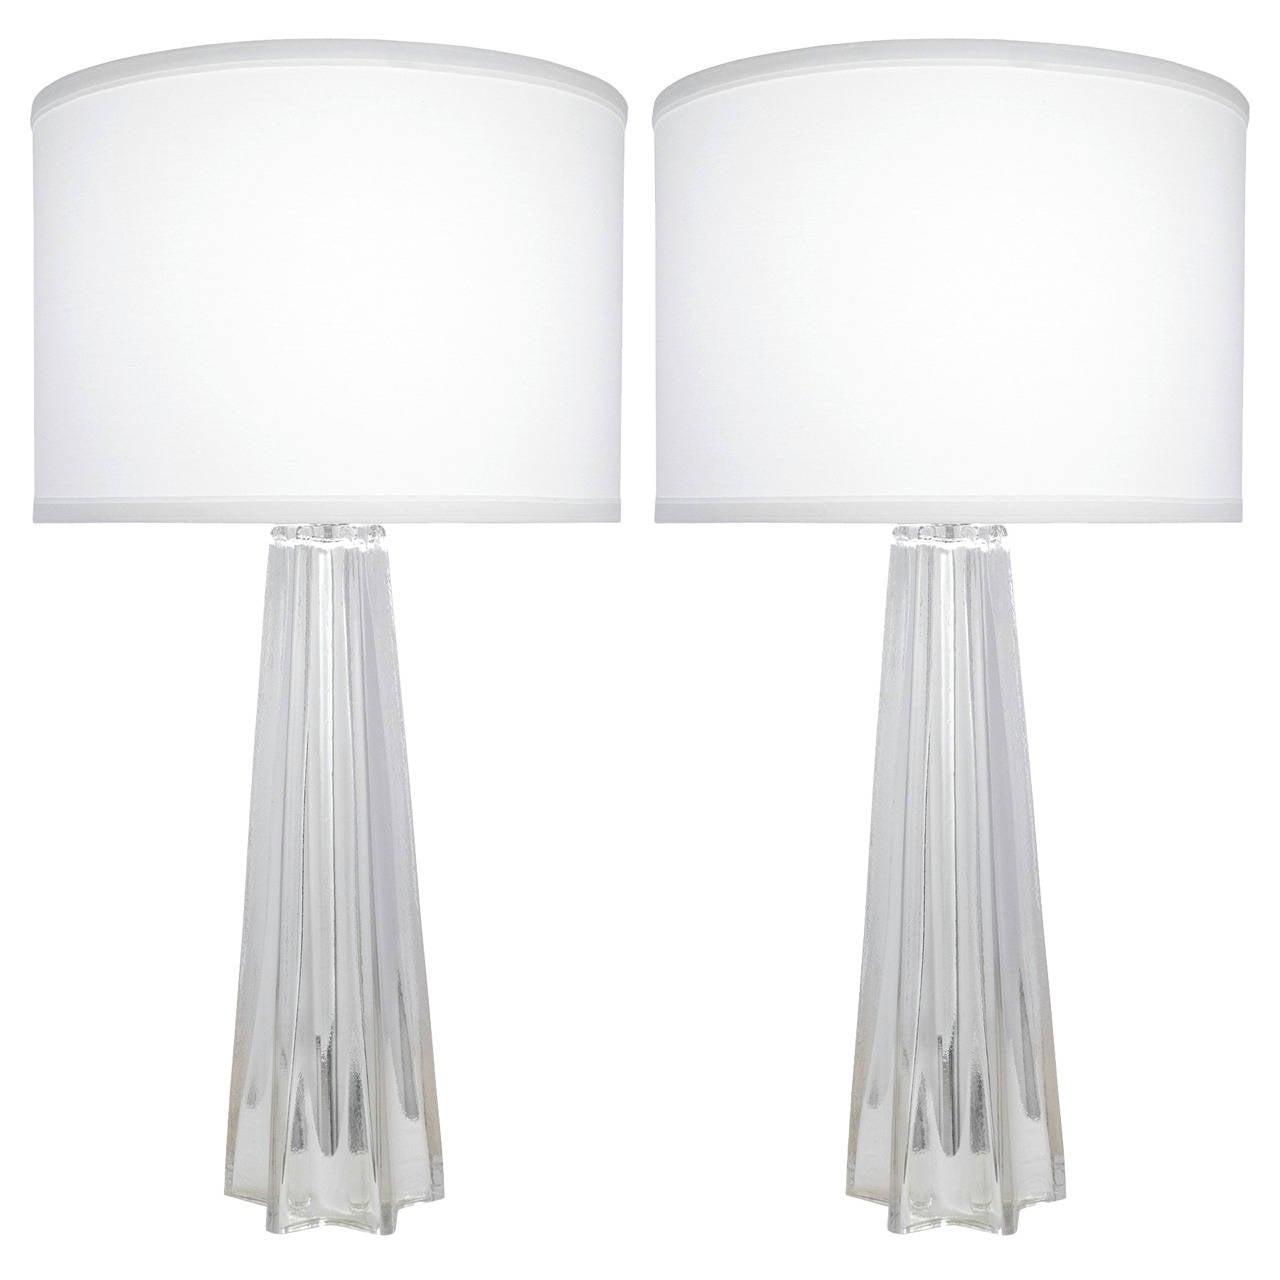 Murano Mercury Glass, Pair of Table Lamps